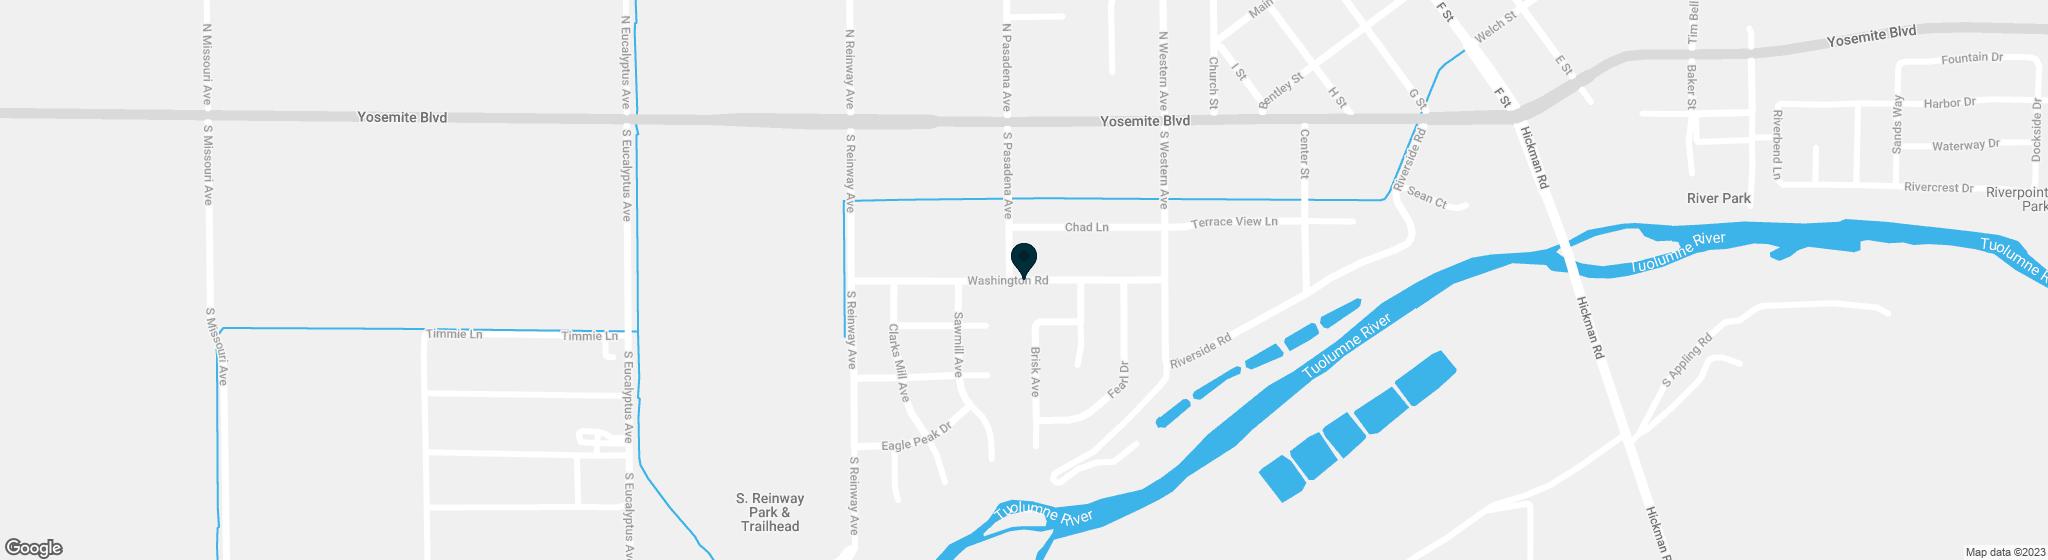 0 South WASHINGTON Avenue Waterford CA 95386